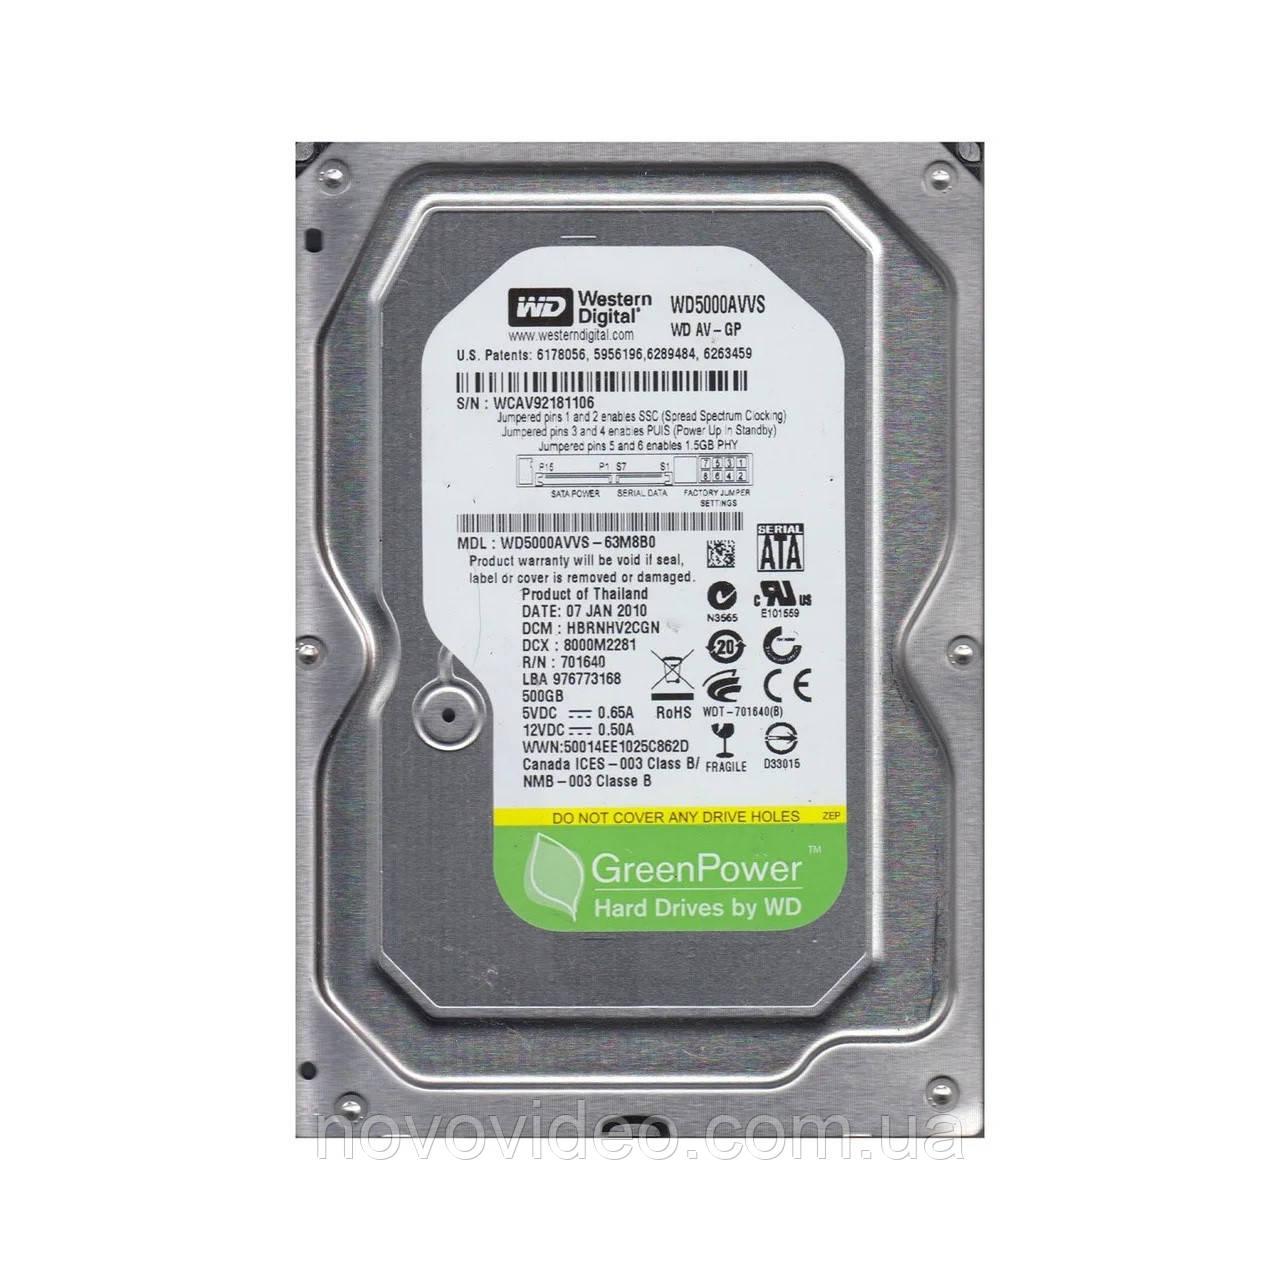 HDD жесткий диск для видеонаблюдения на 500 Гб WD Sata 3,5